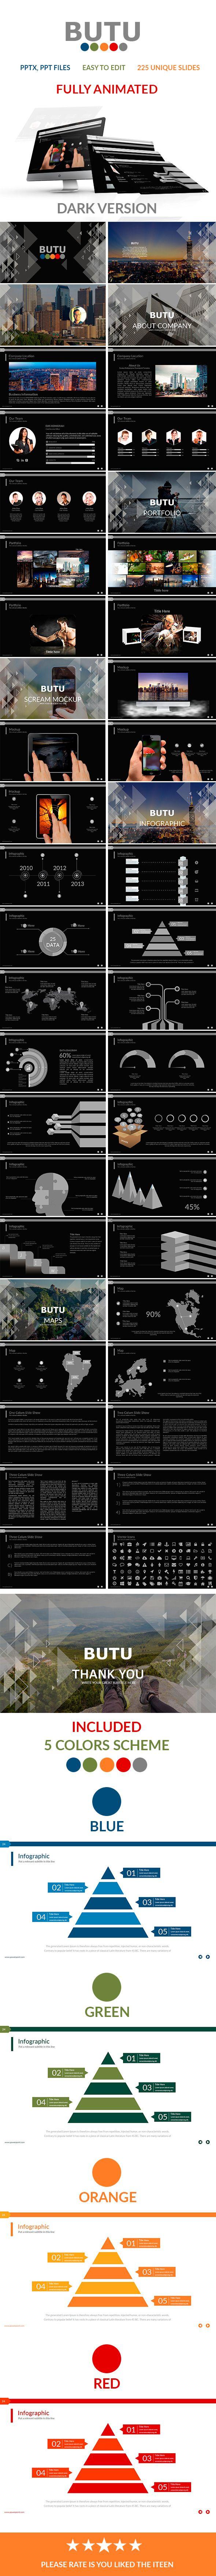 Butu V.2 Powerpoint Presentation (PowerPoint Templates)